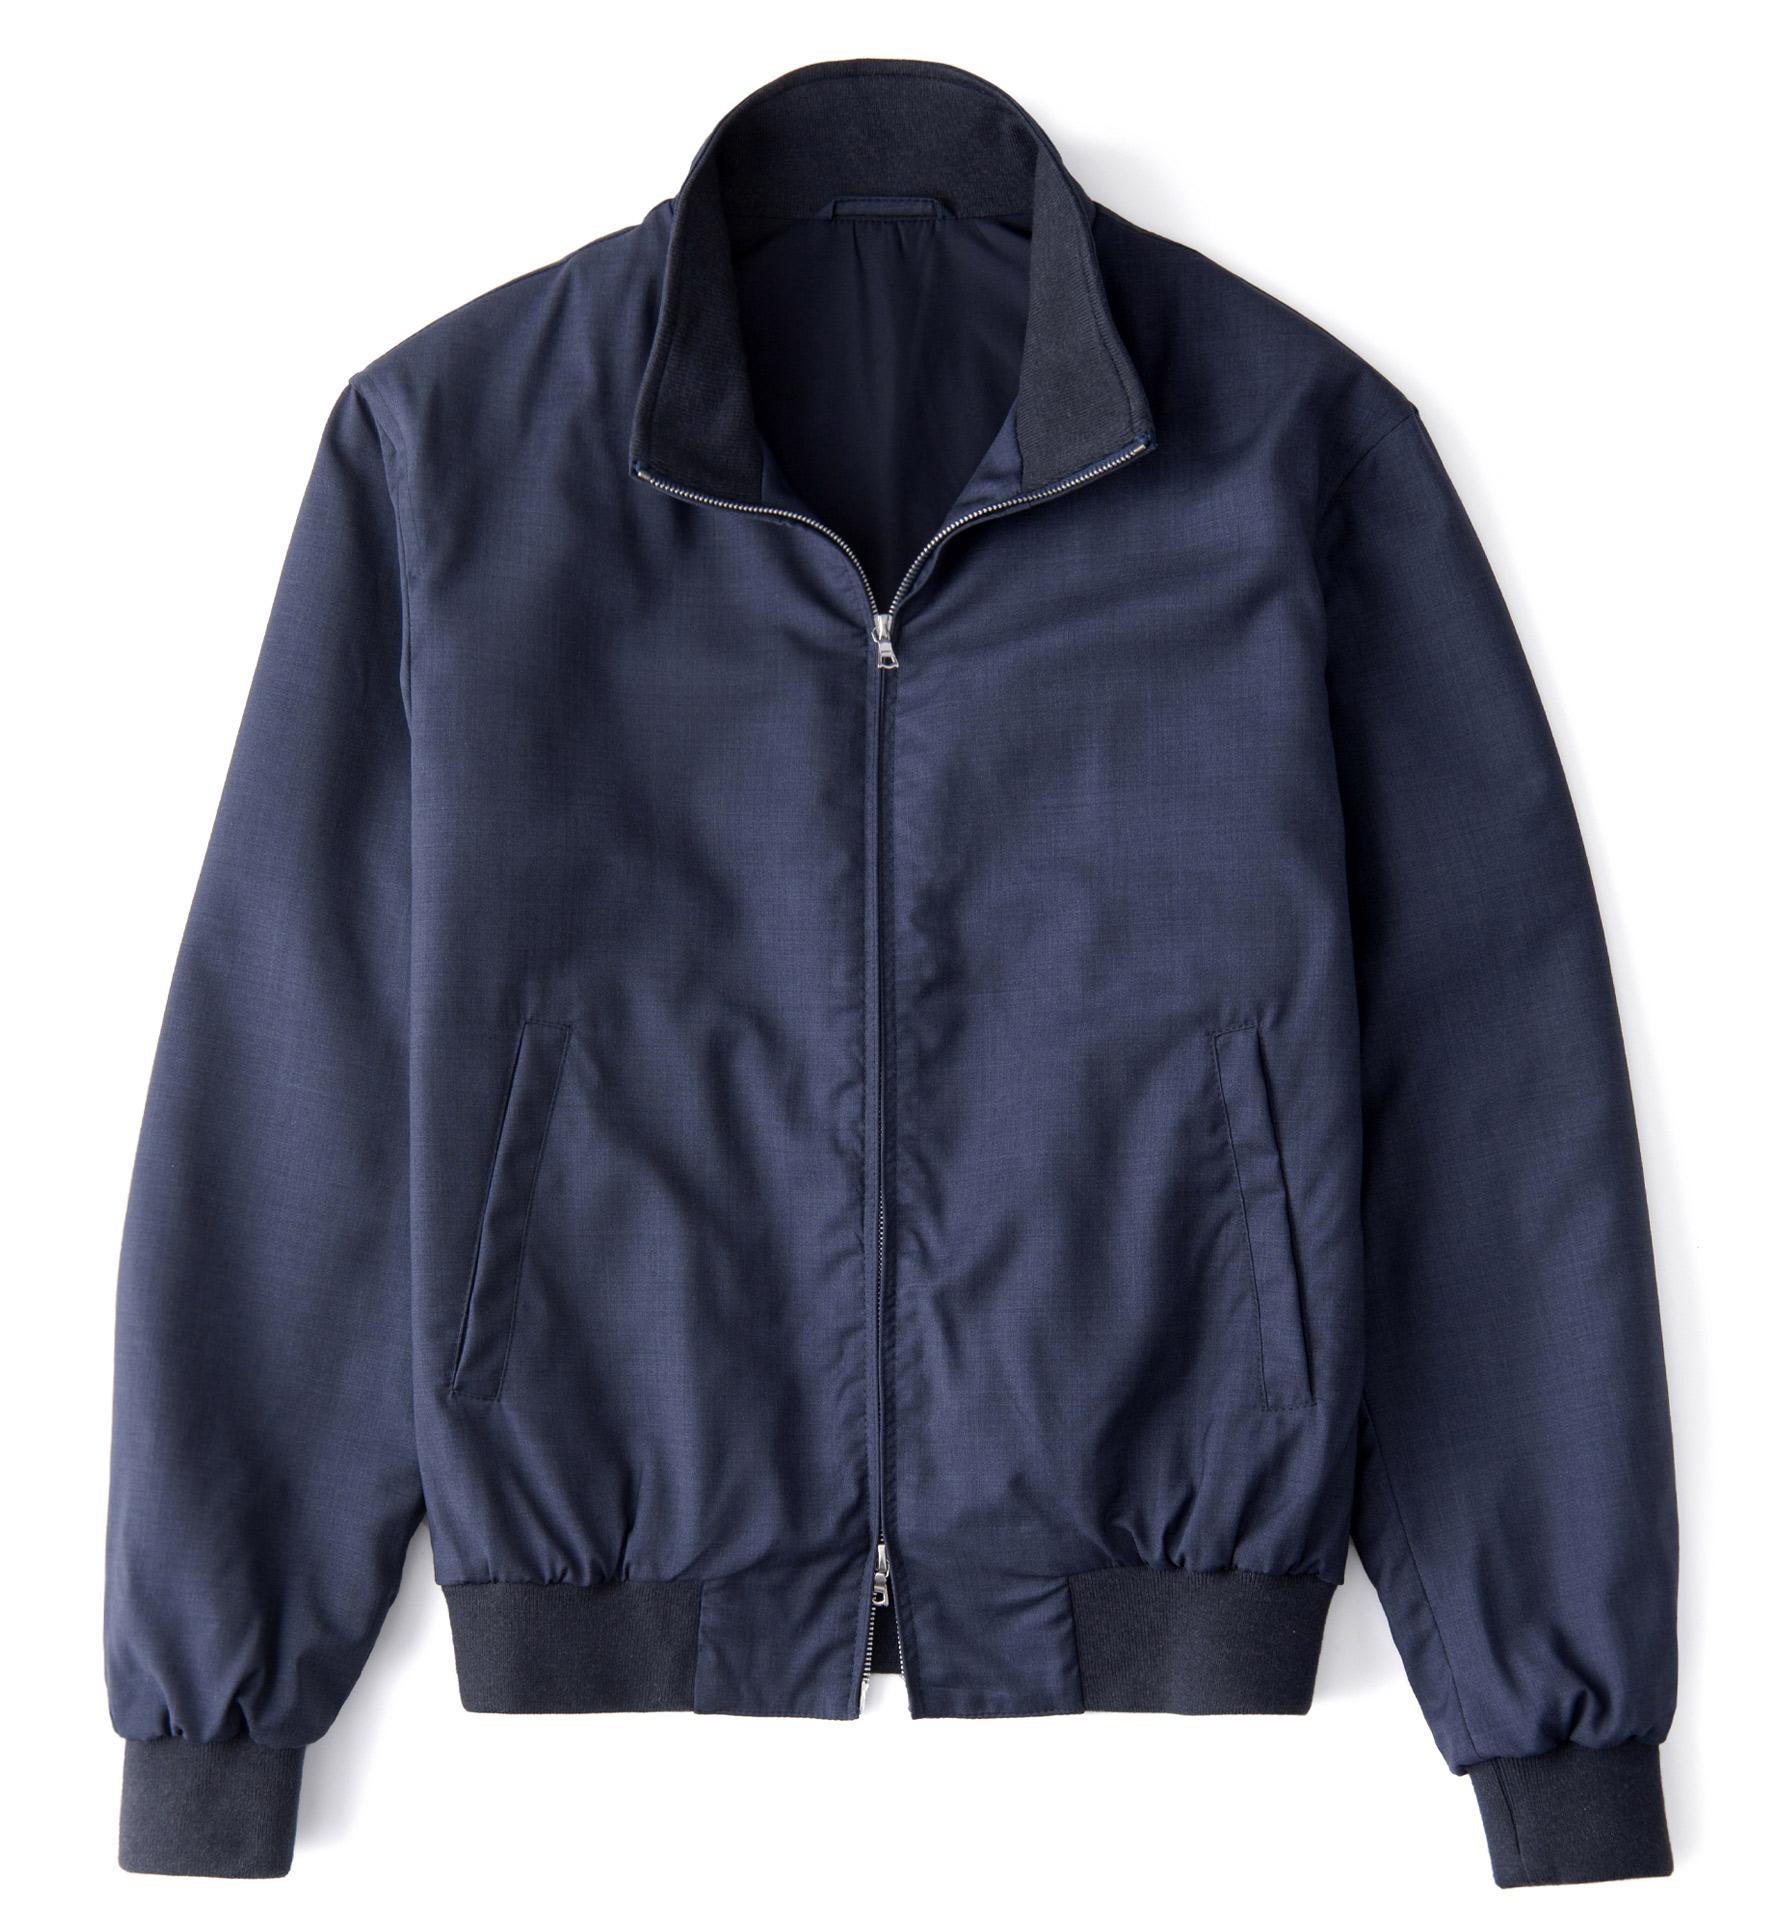 Zoom Image of Lucca Slate Blue Merino Wool Jacket